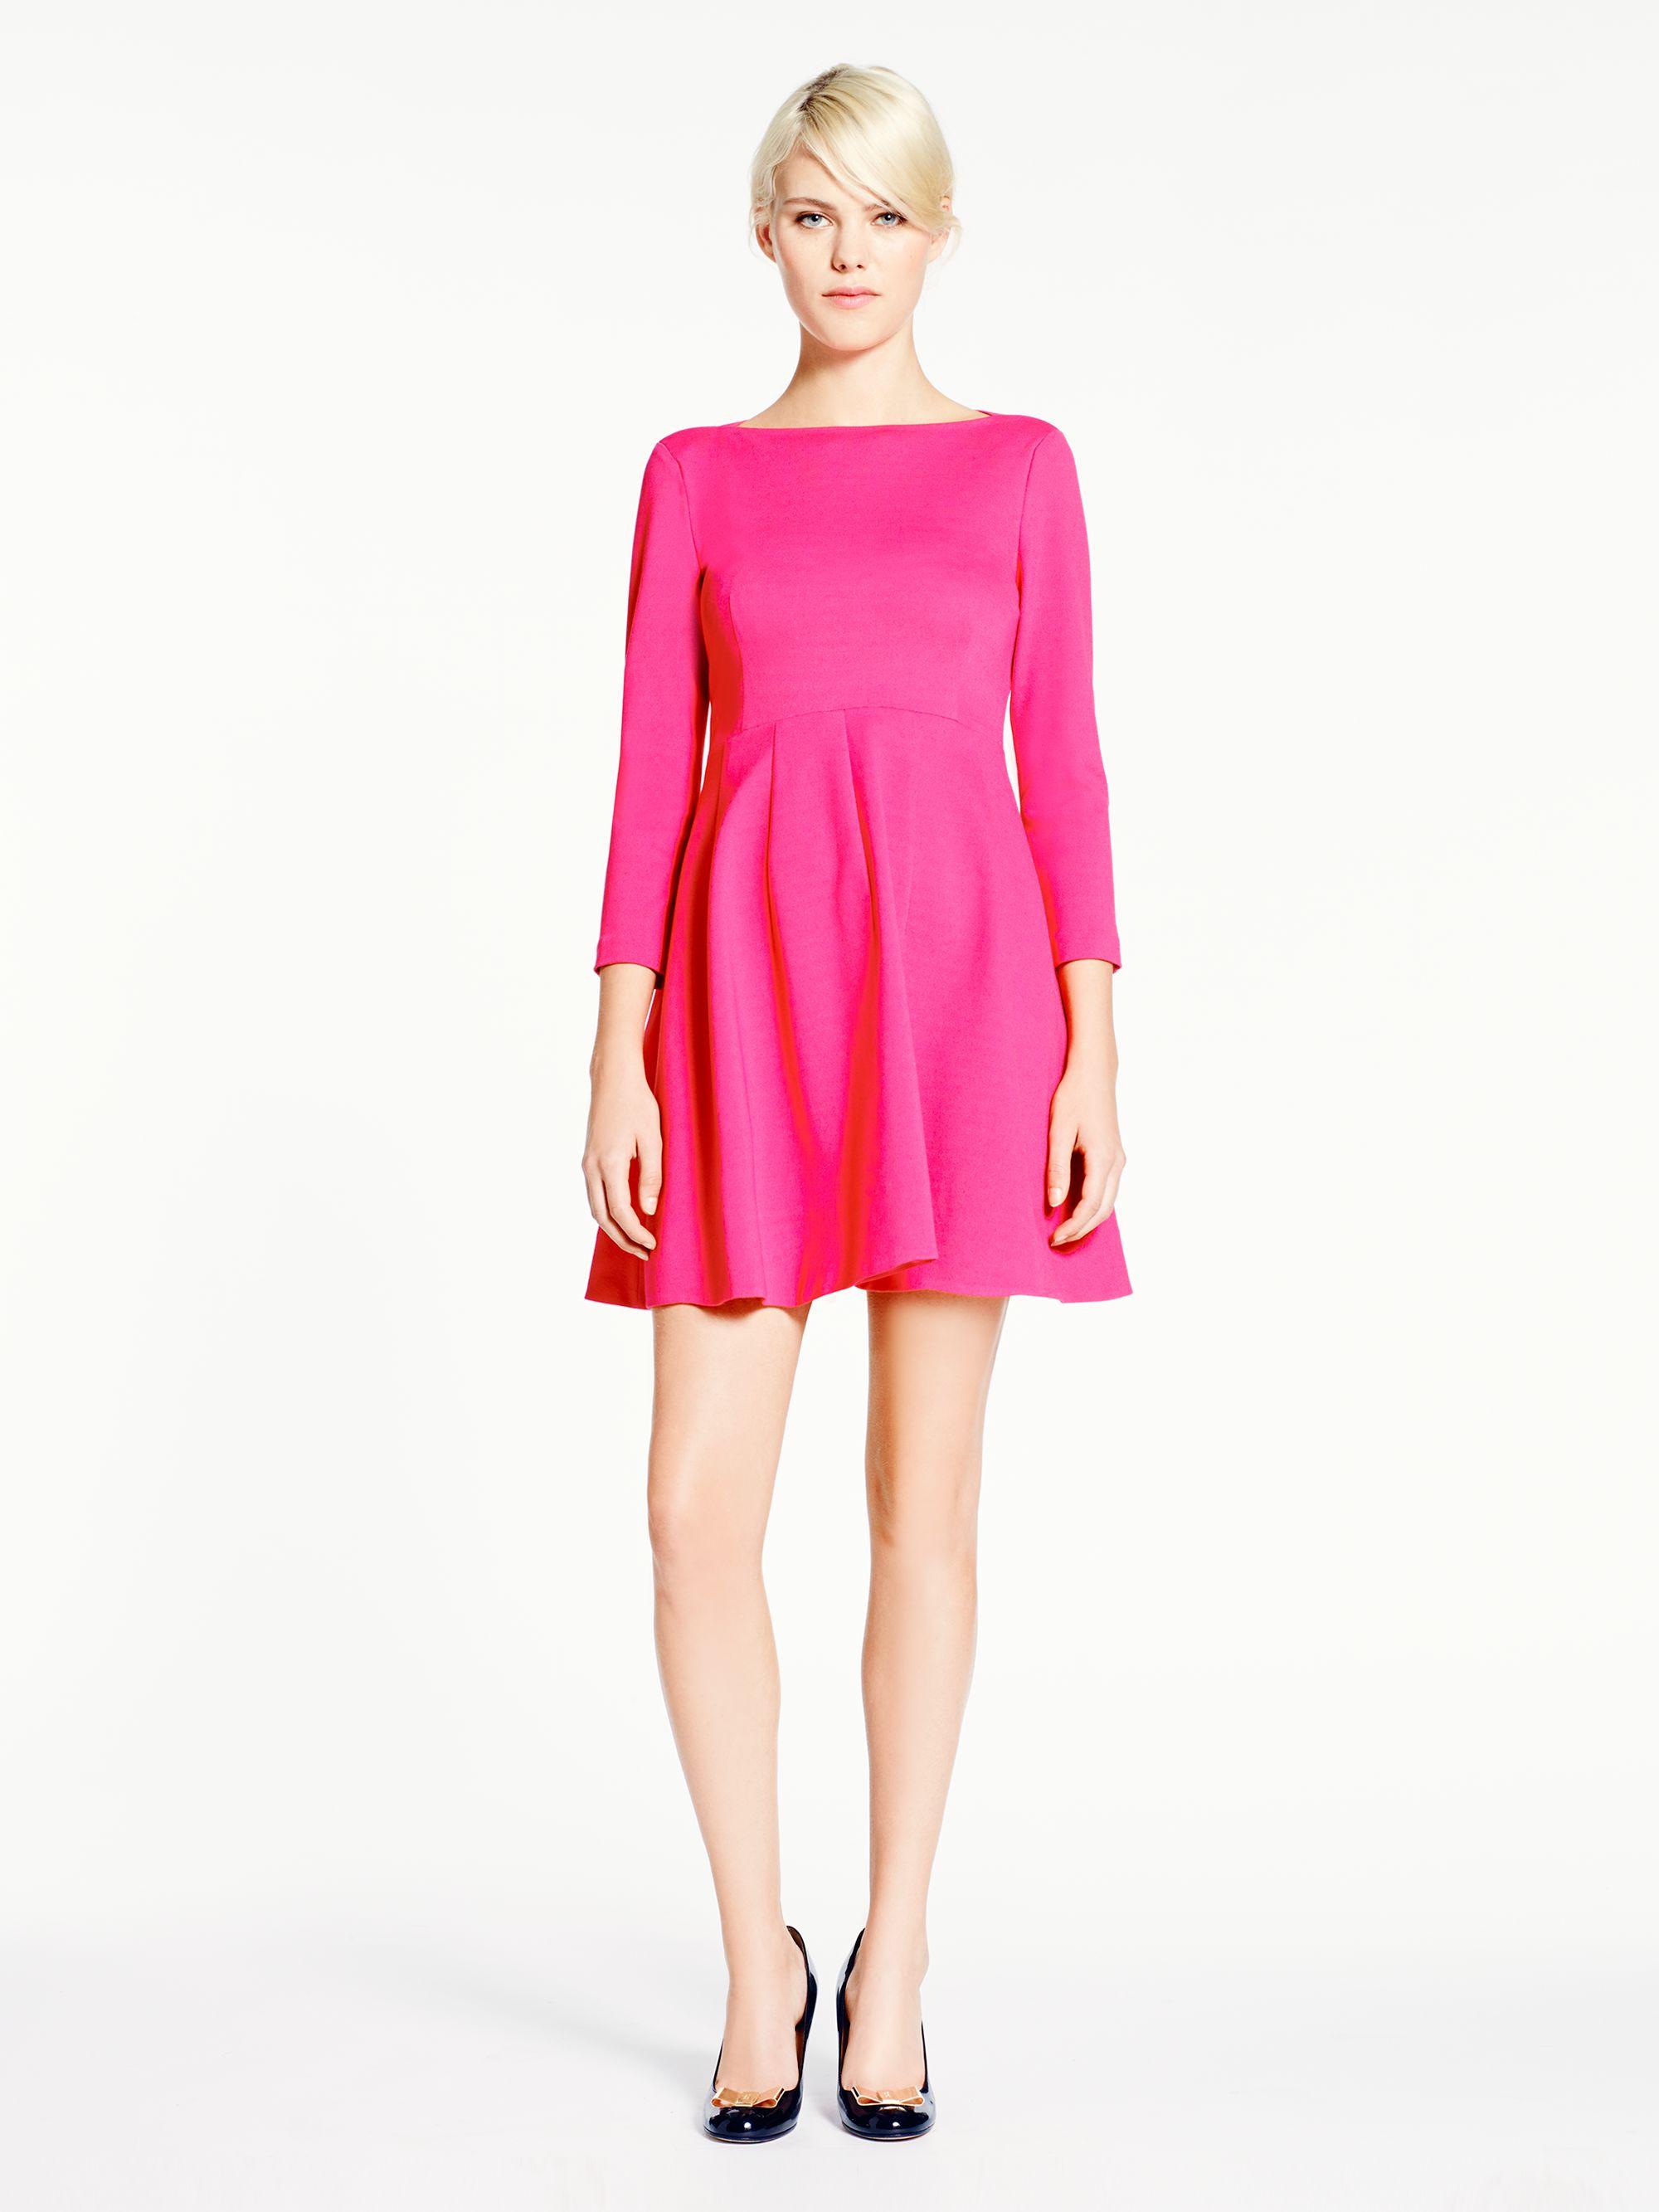 Lyst Kate Spade New York Selma Dress In Pink